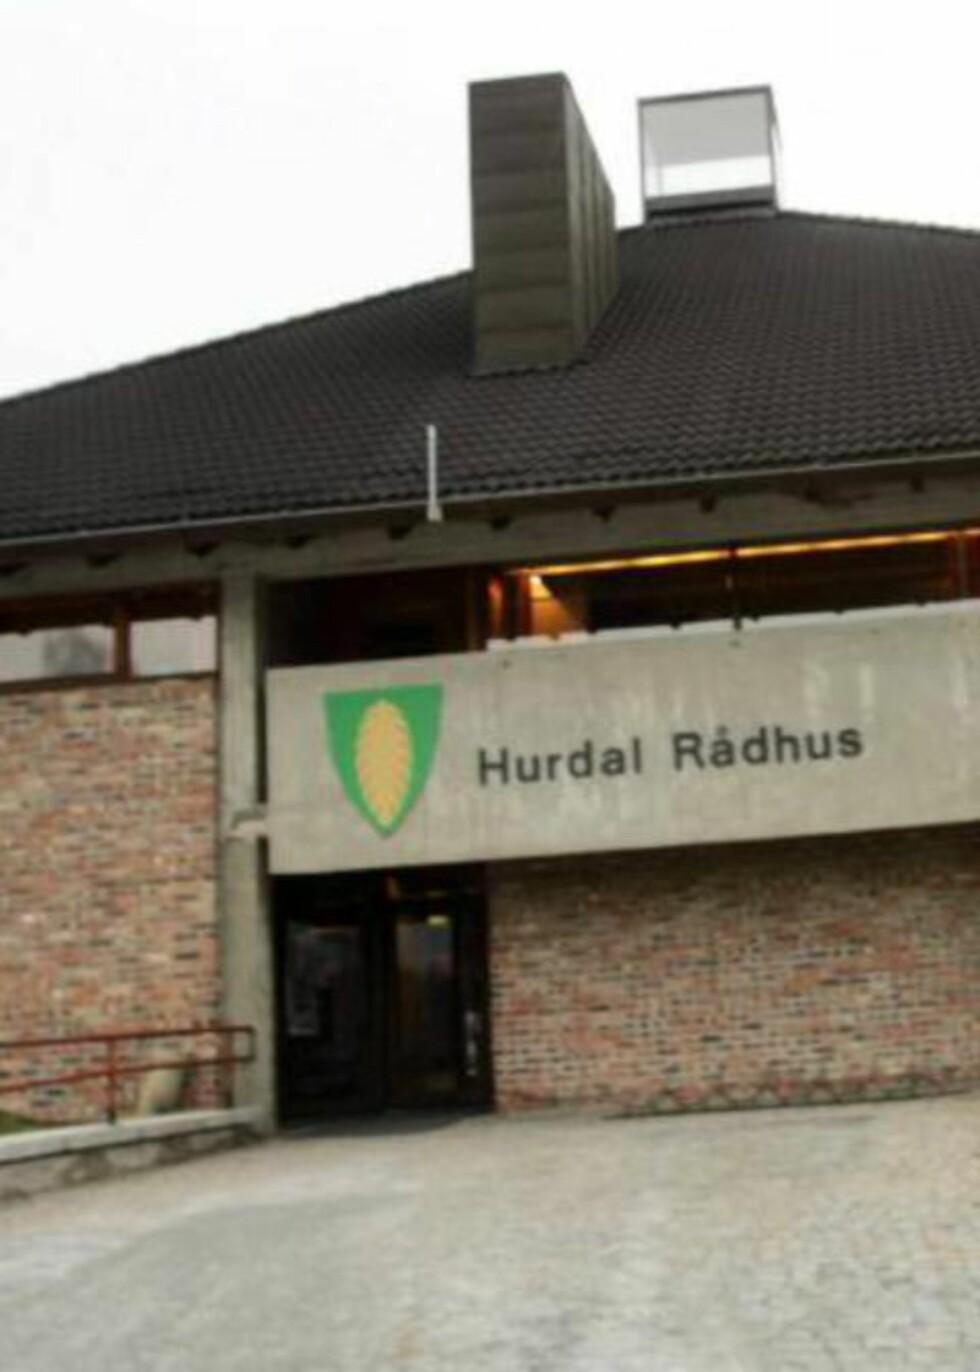 PUSSES OPP: Rådhuset i Hurdal kommune. Foto: NTB SCANPIX